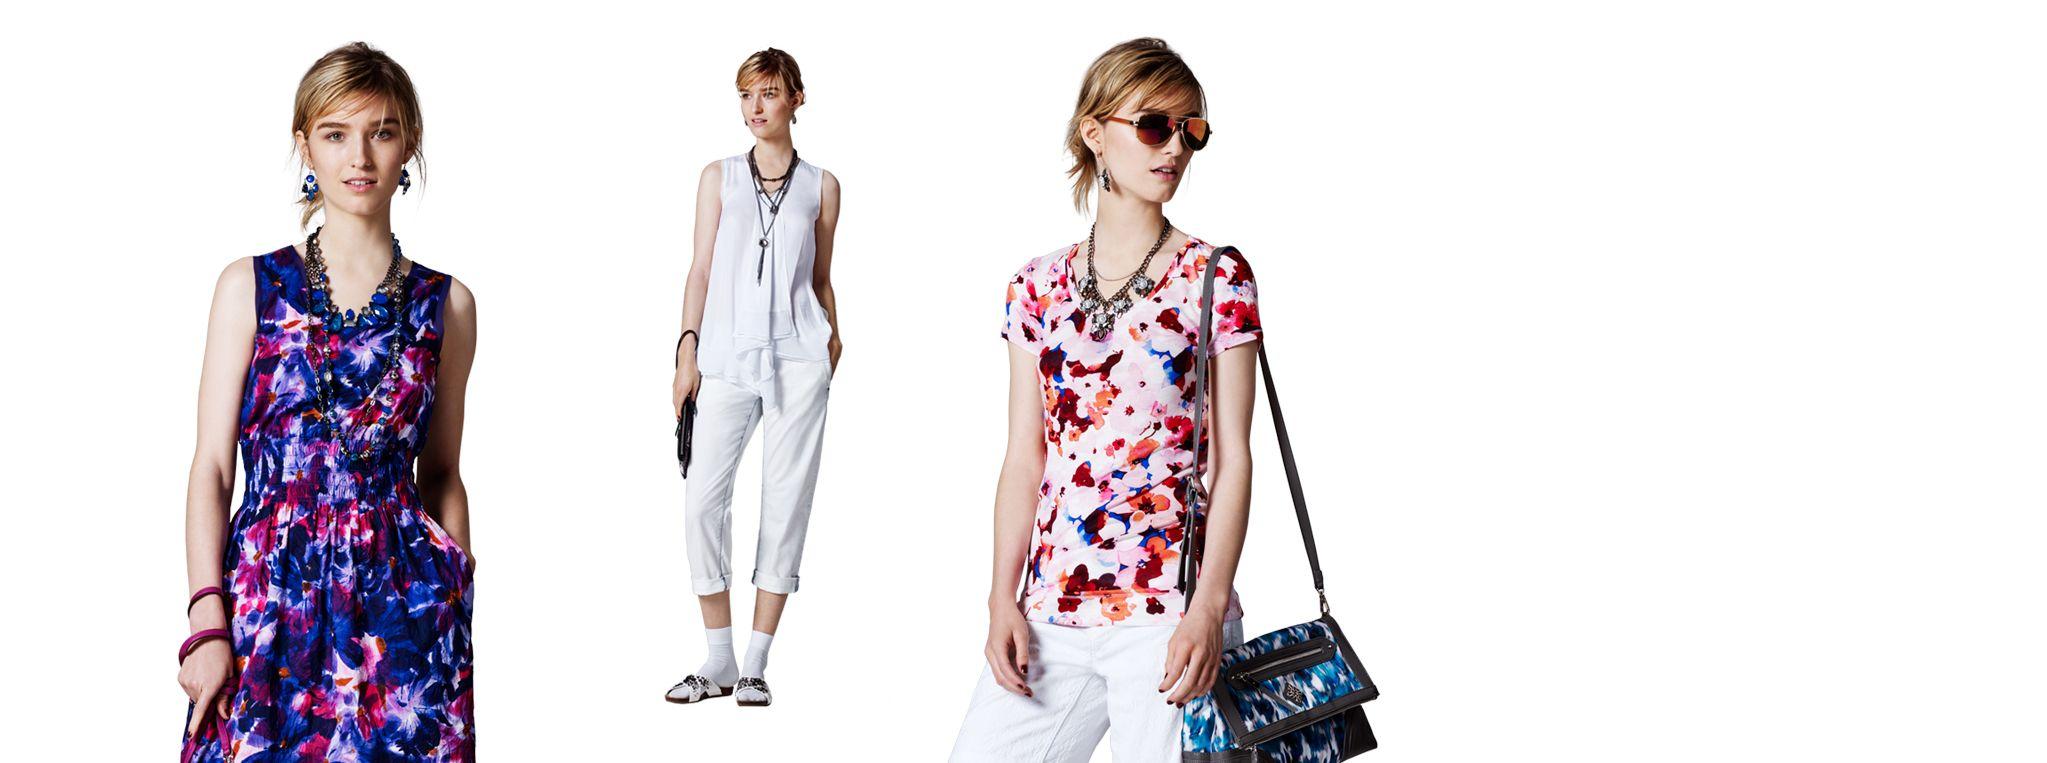 shop Simply Vera Vera Wang latest looks